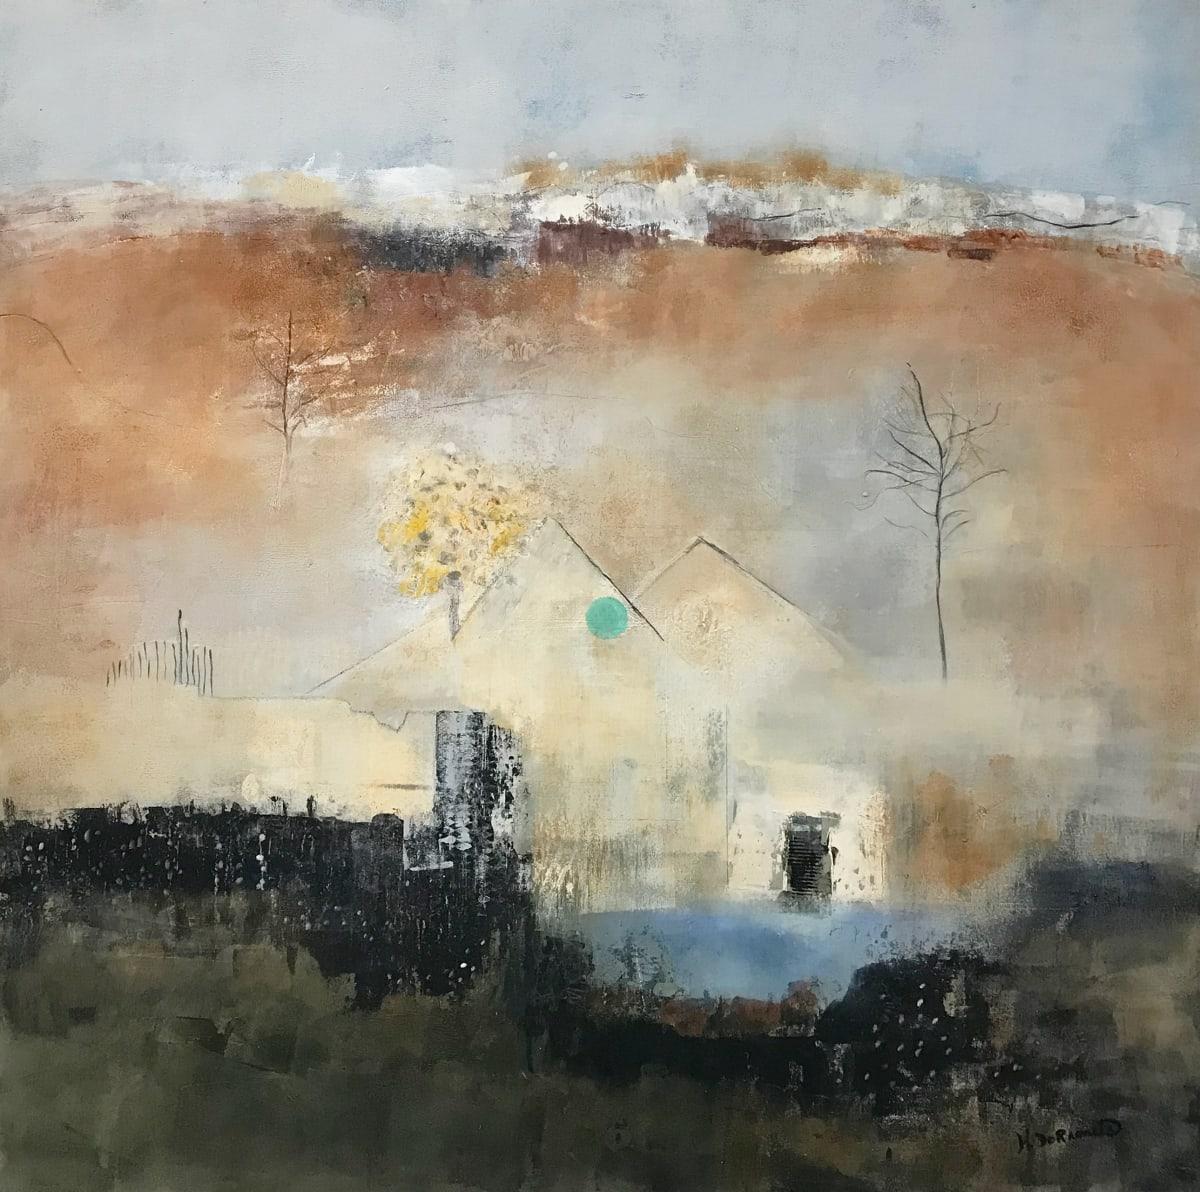 """A New Beginning"" by Helen DeRamus"